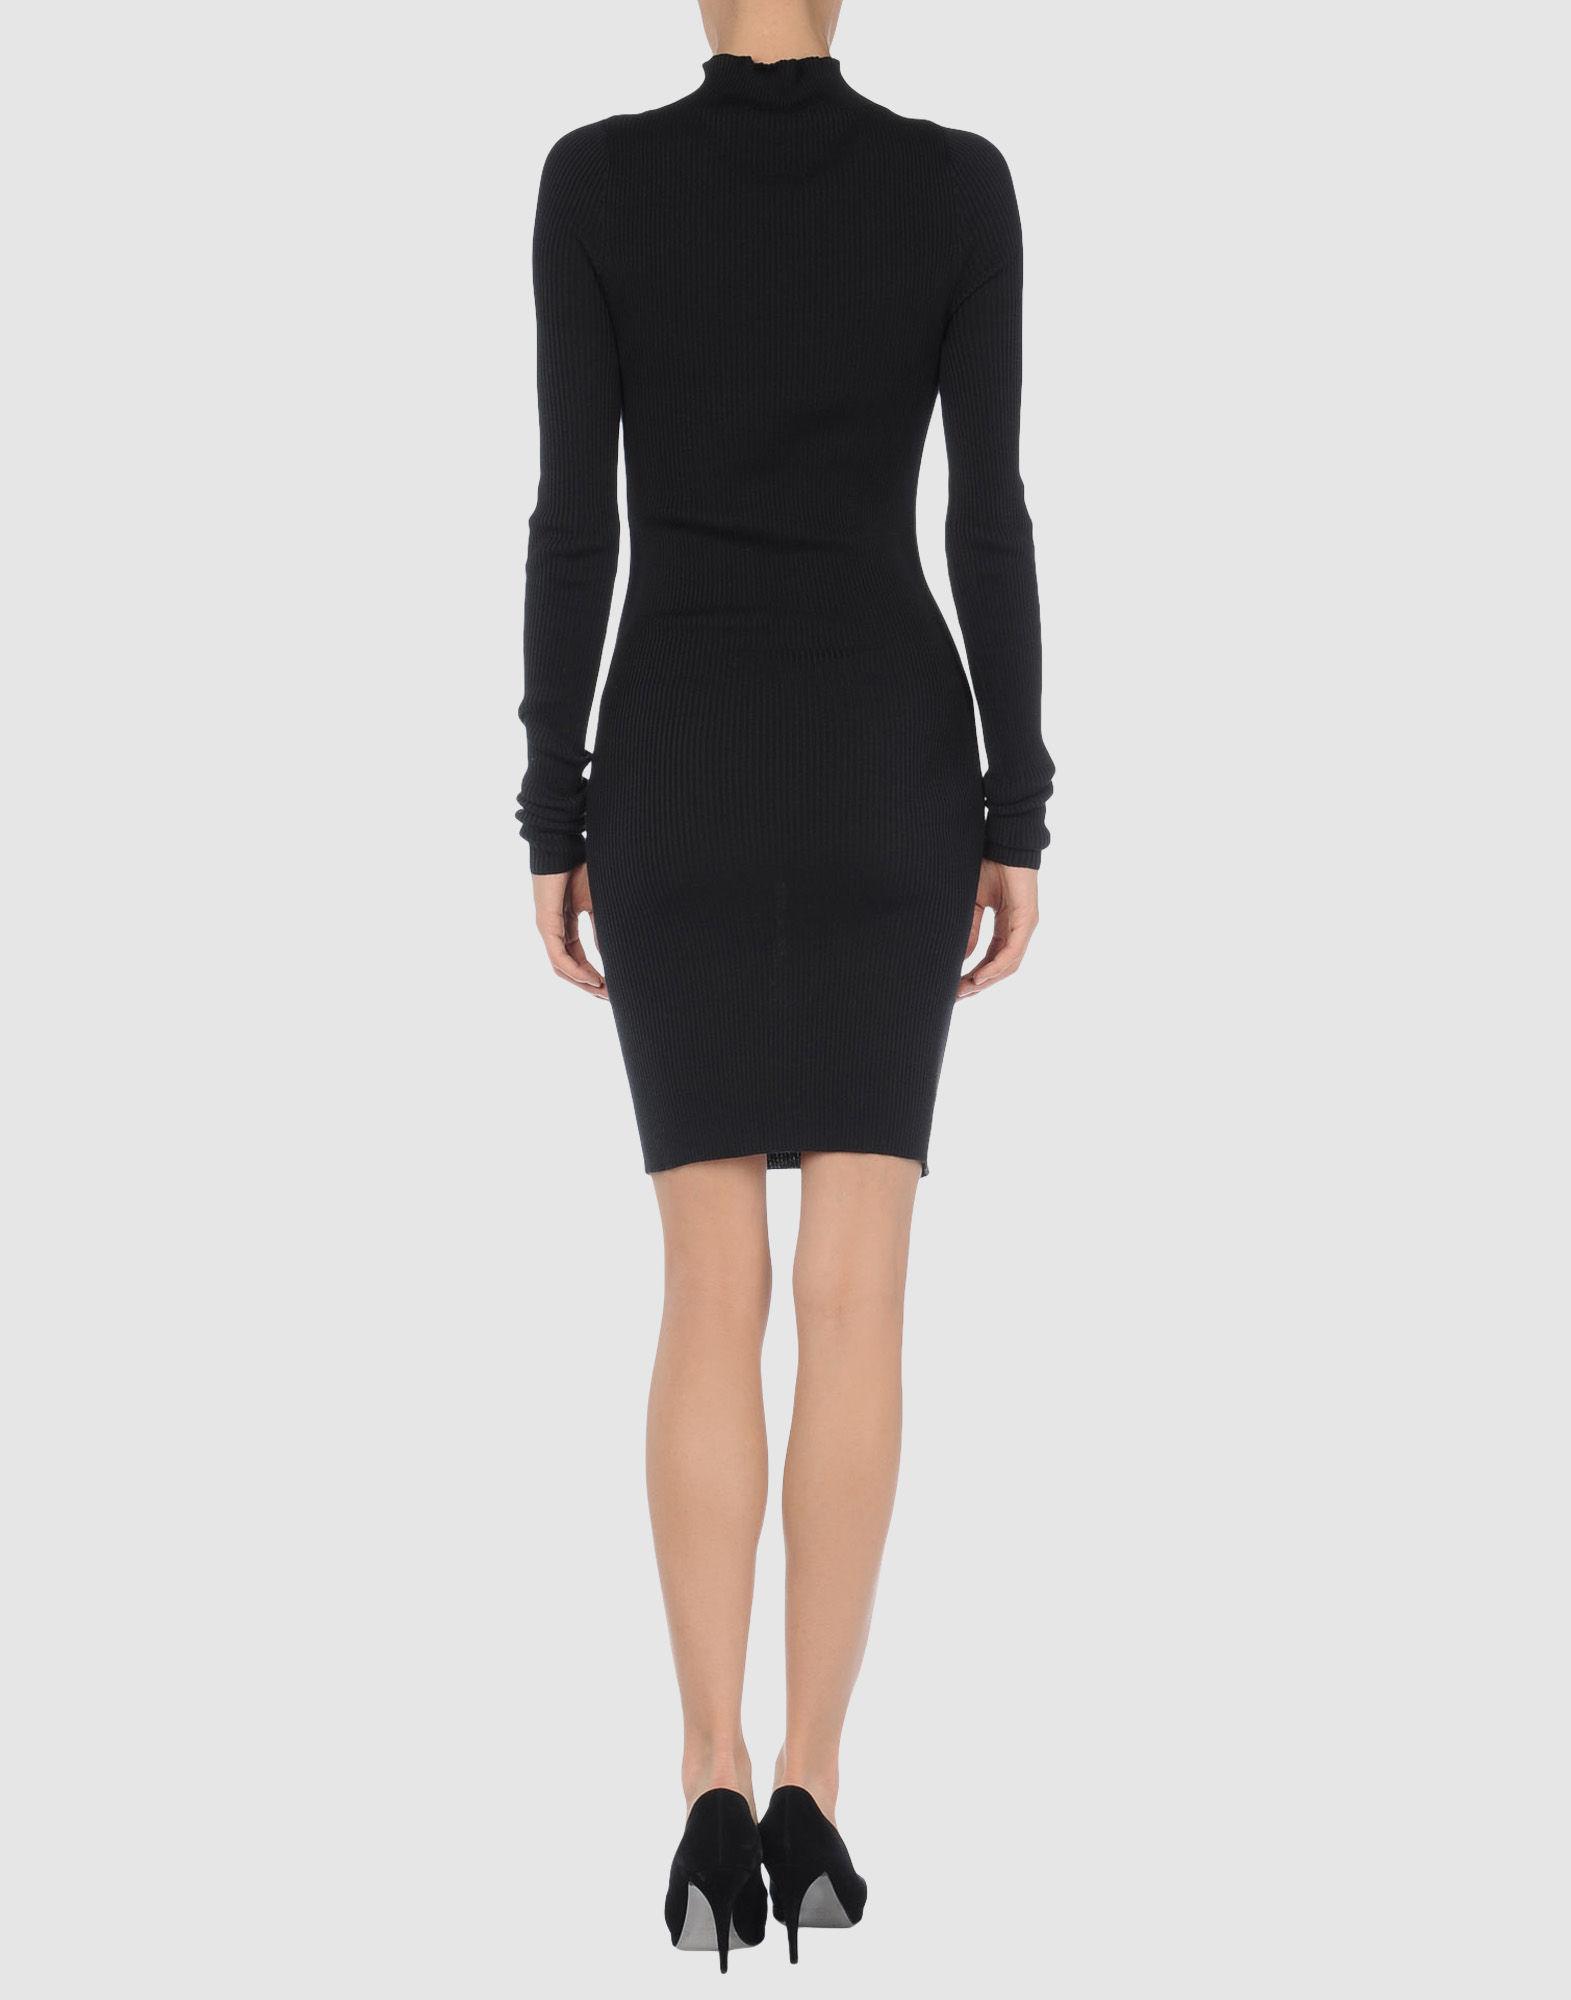 34222449AQ 14 r - Βραδυνα Φορεματα Yves Saint Laurent Rive Gauche Κωδ.24